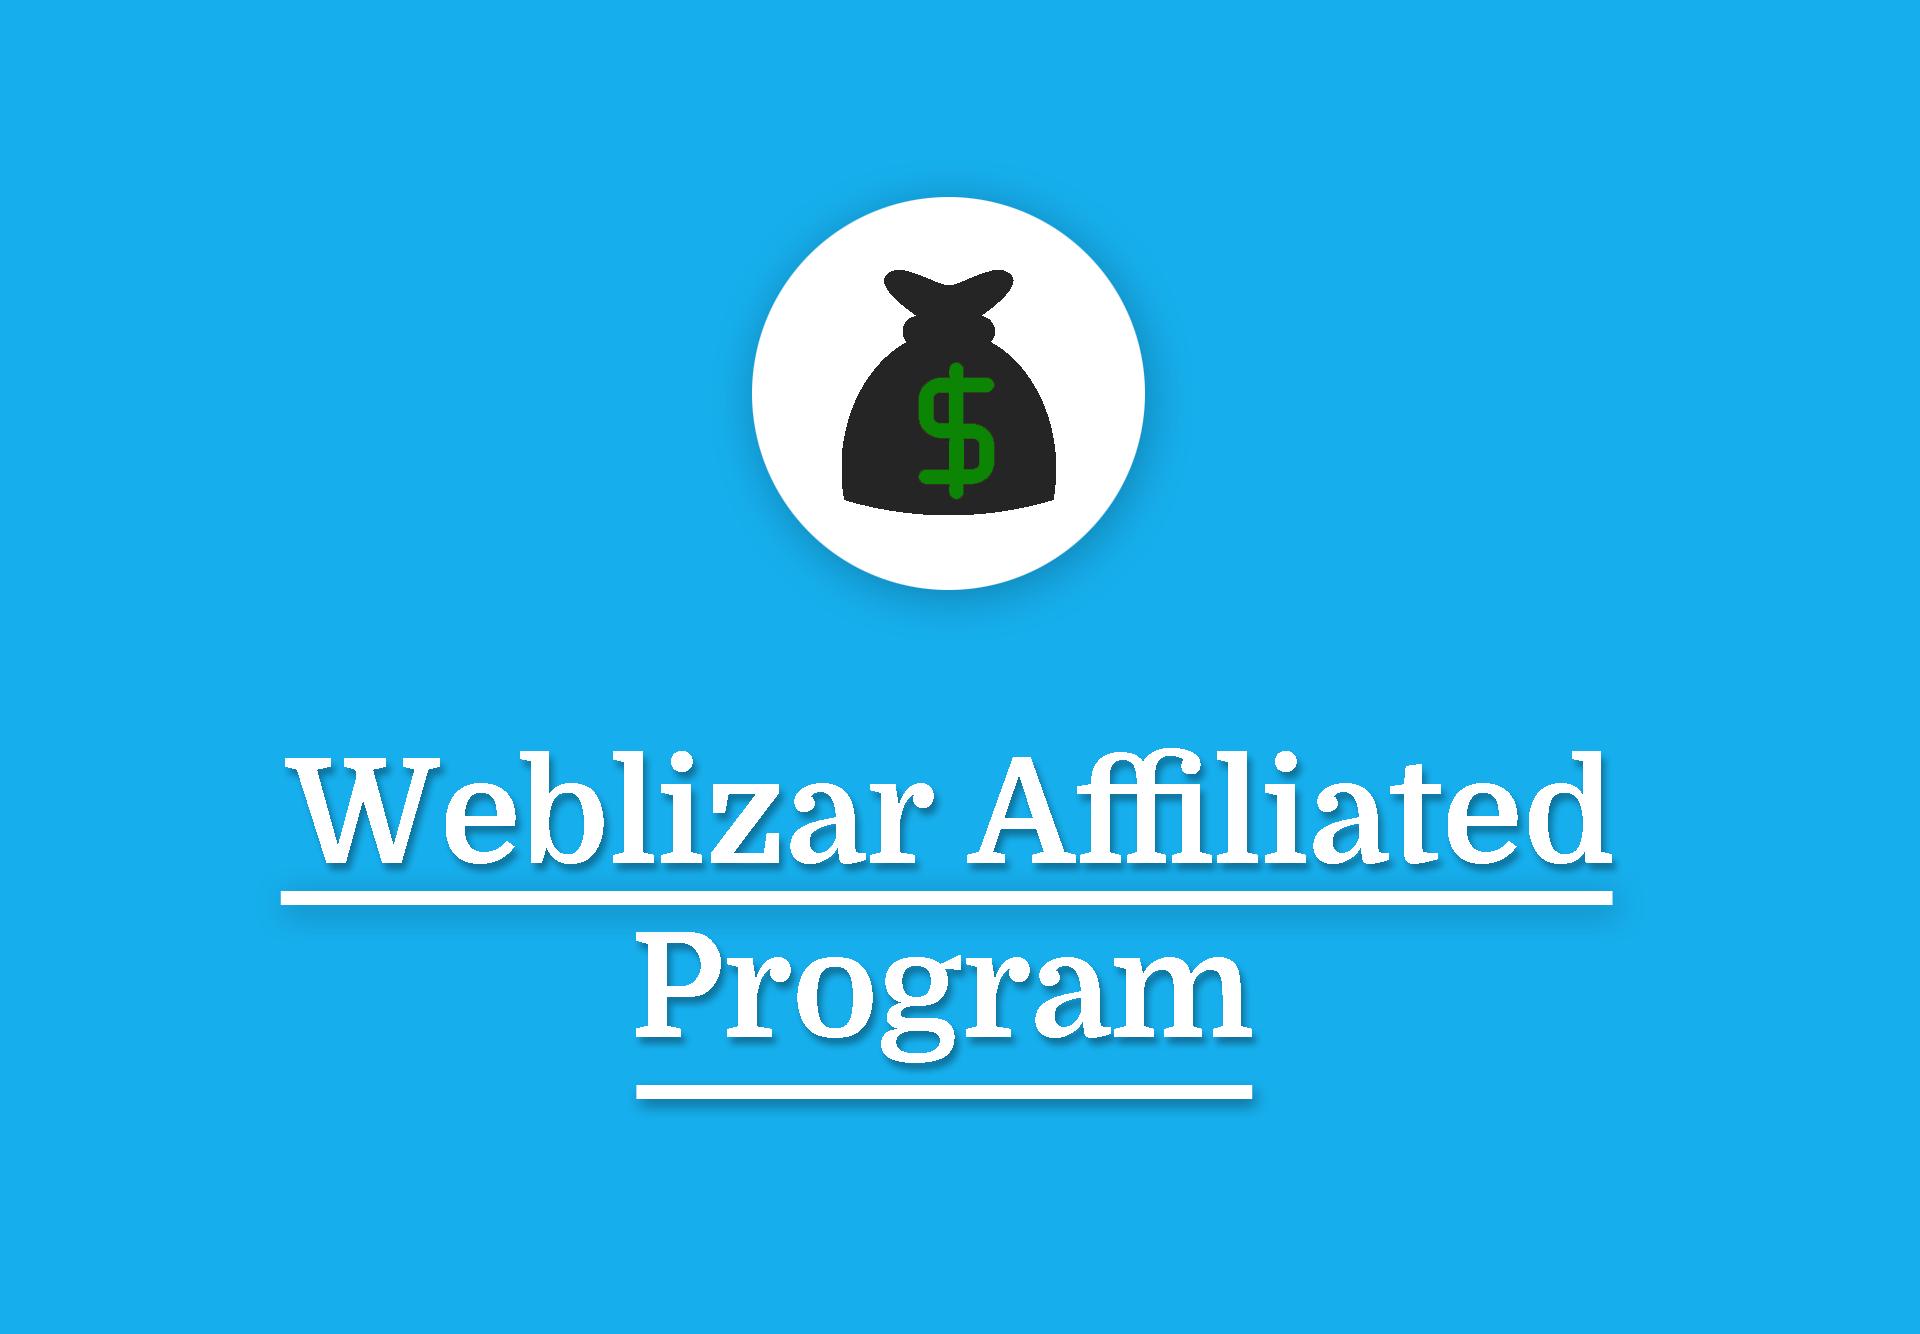 Weblizar Affiliate Program